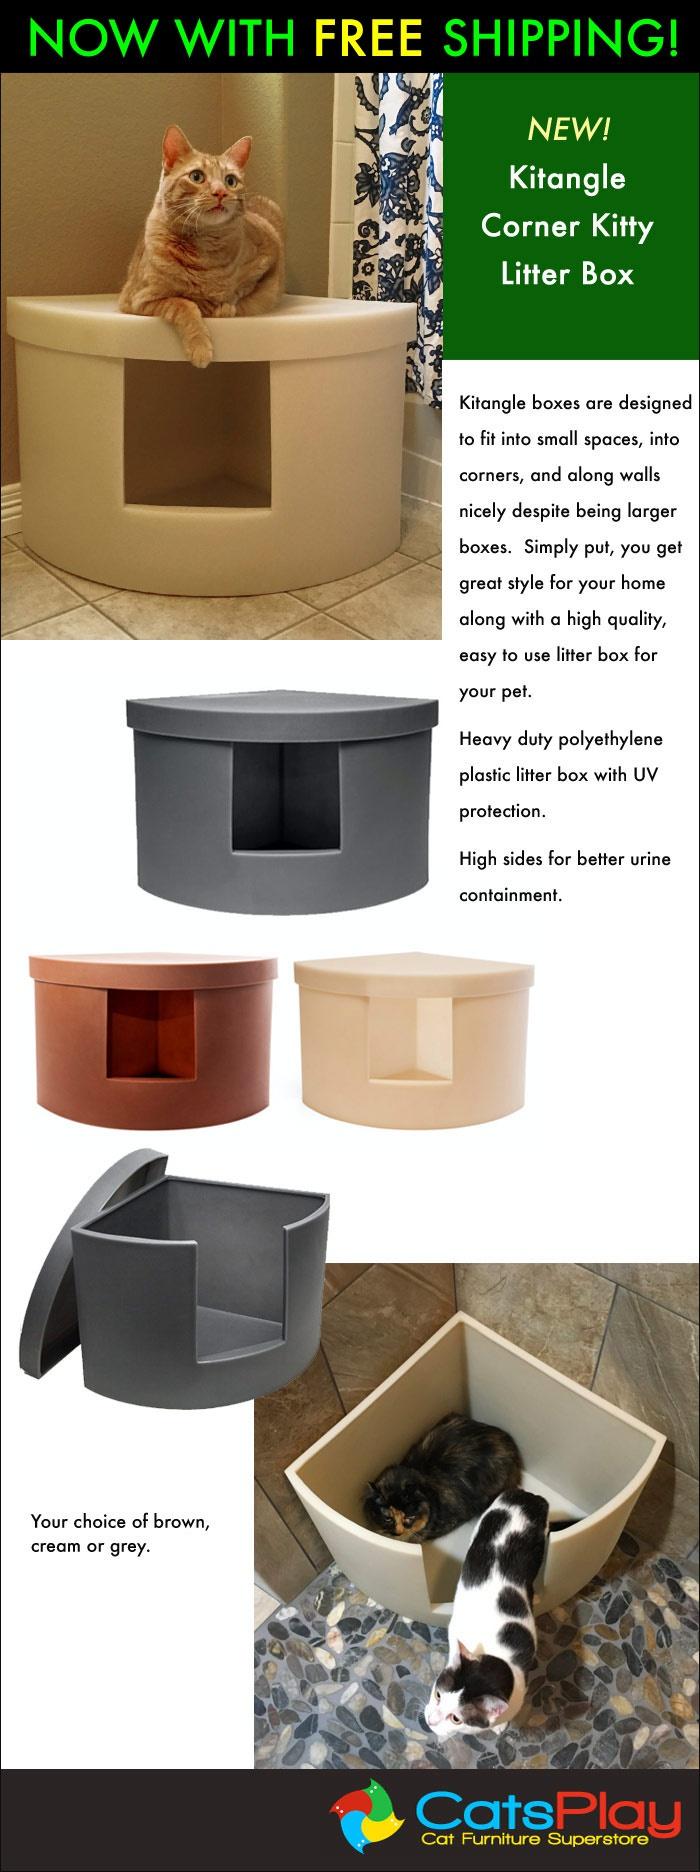 new sleek space saving kitangle corner cat litter box